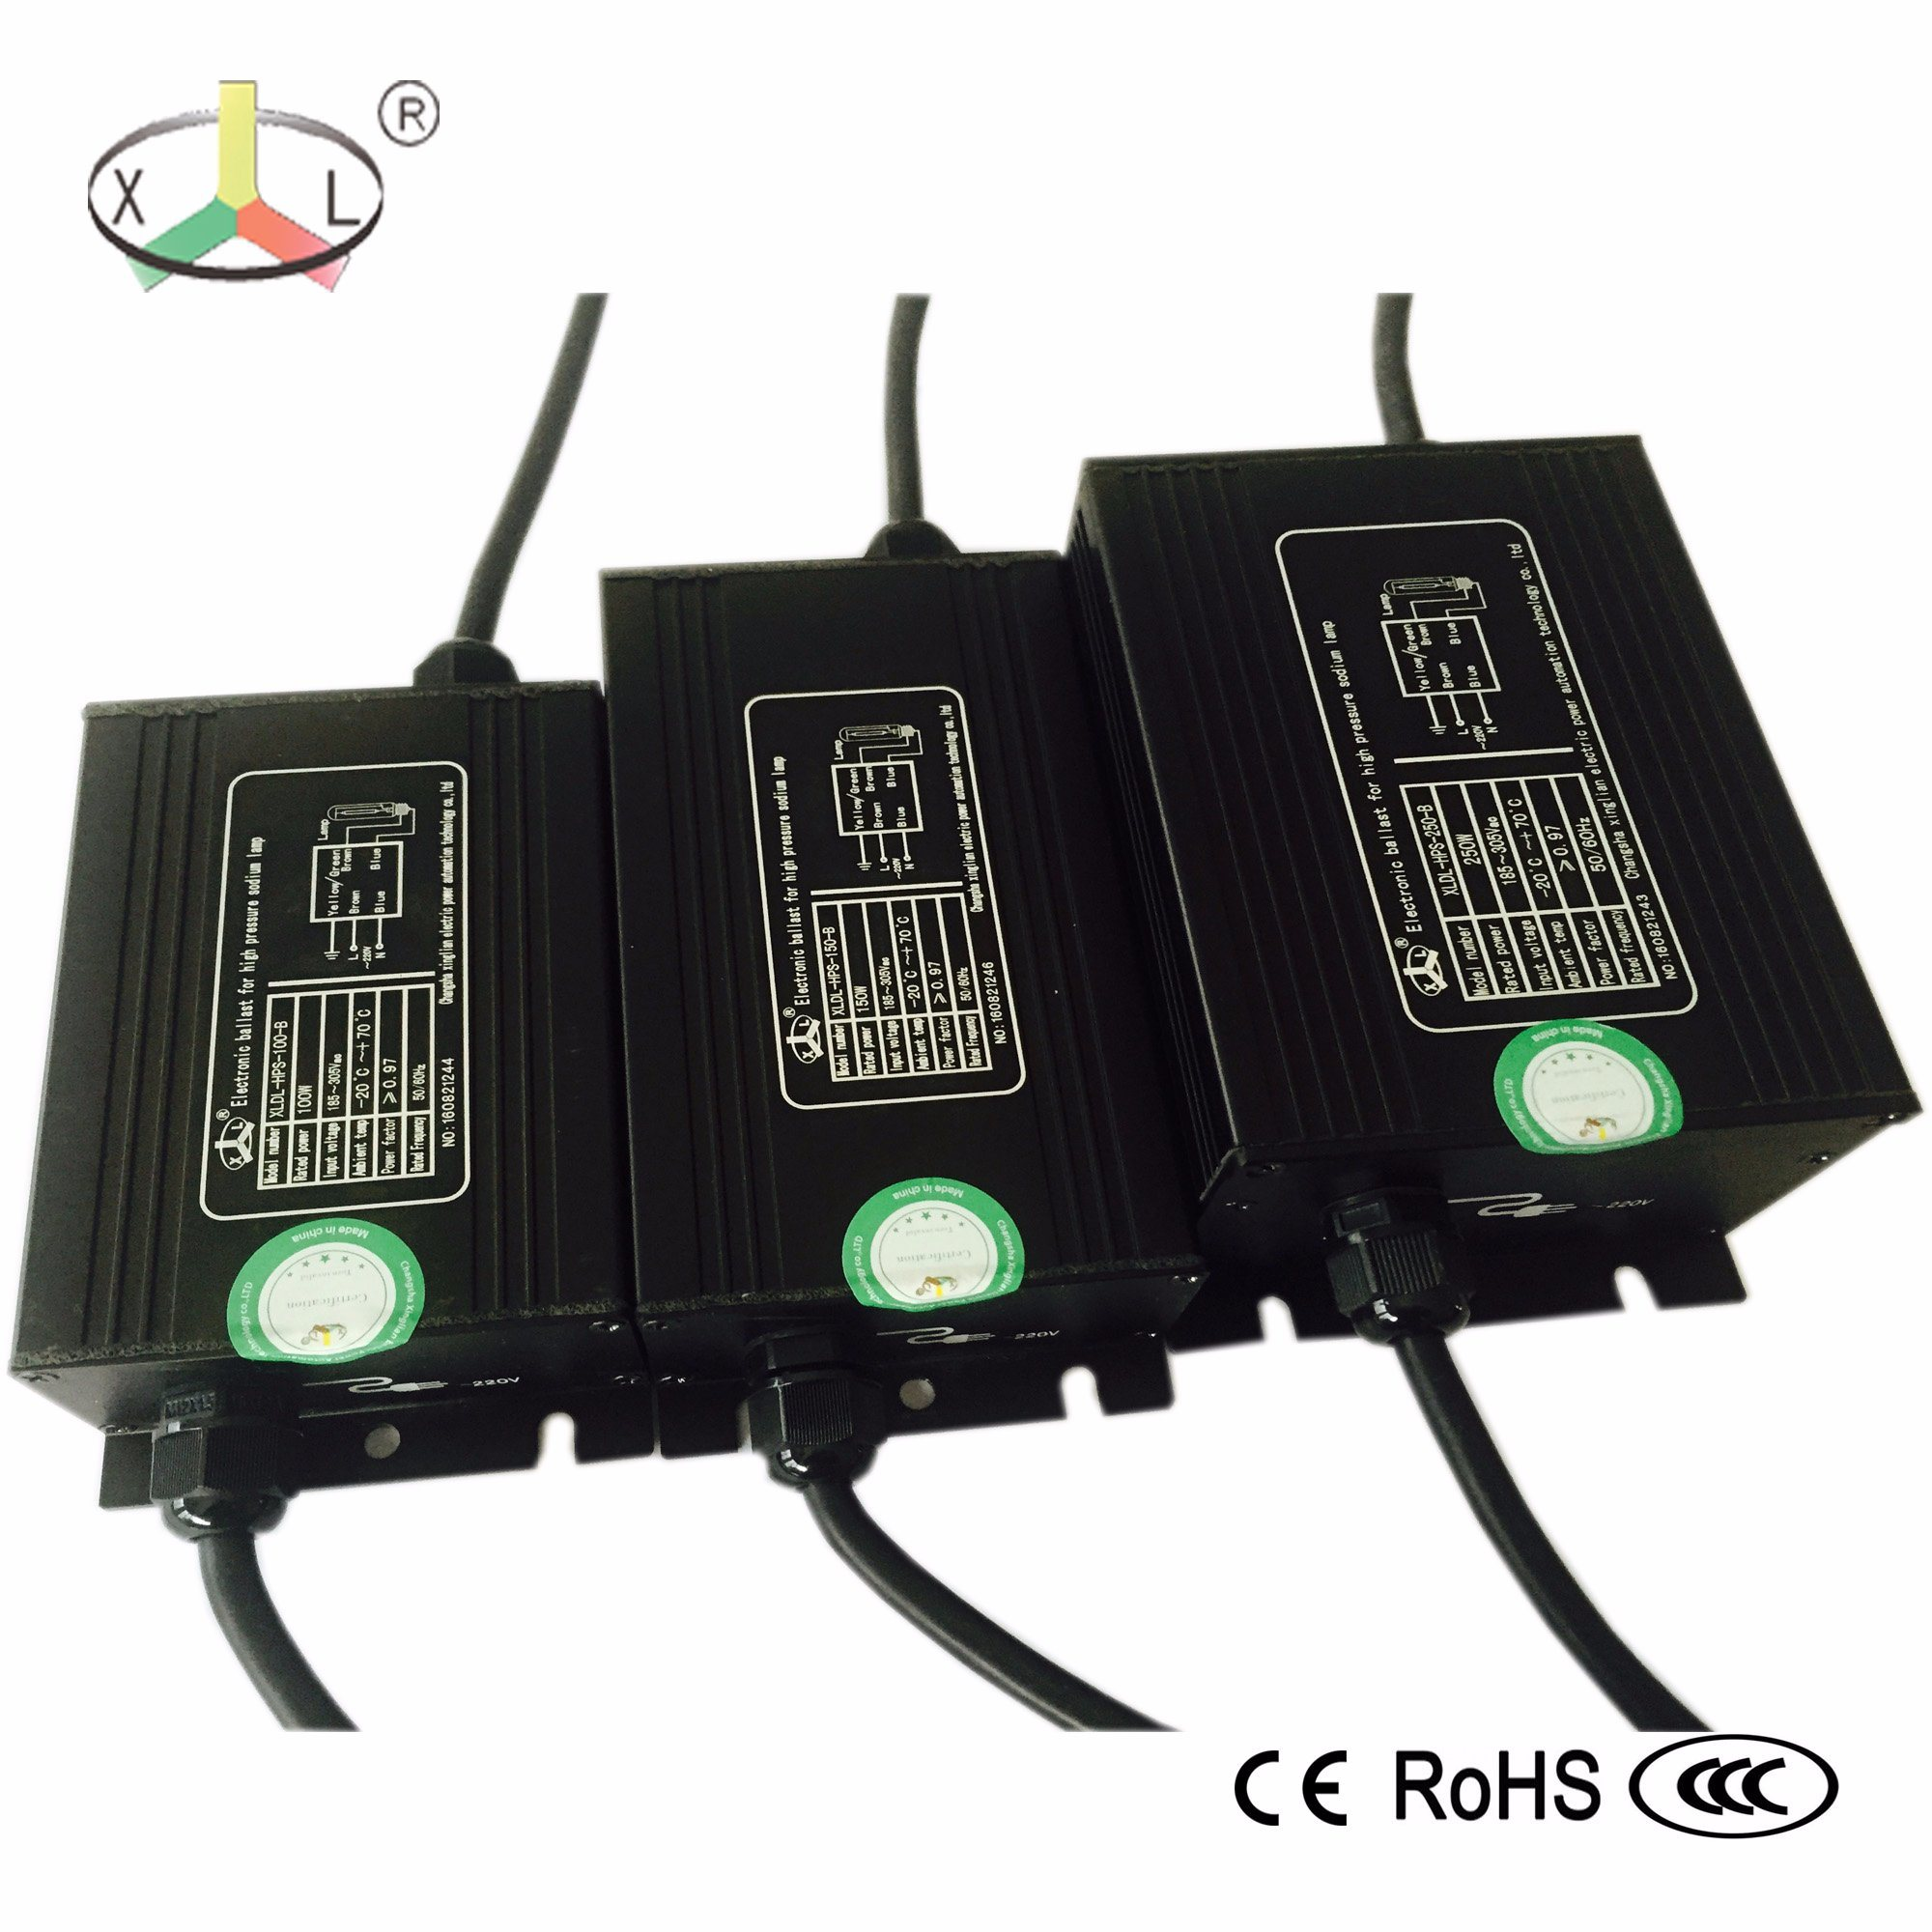 HID Electronic Ballast 1000W